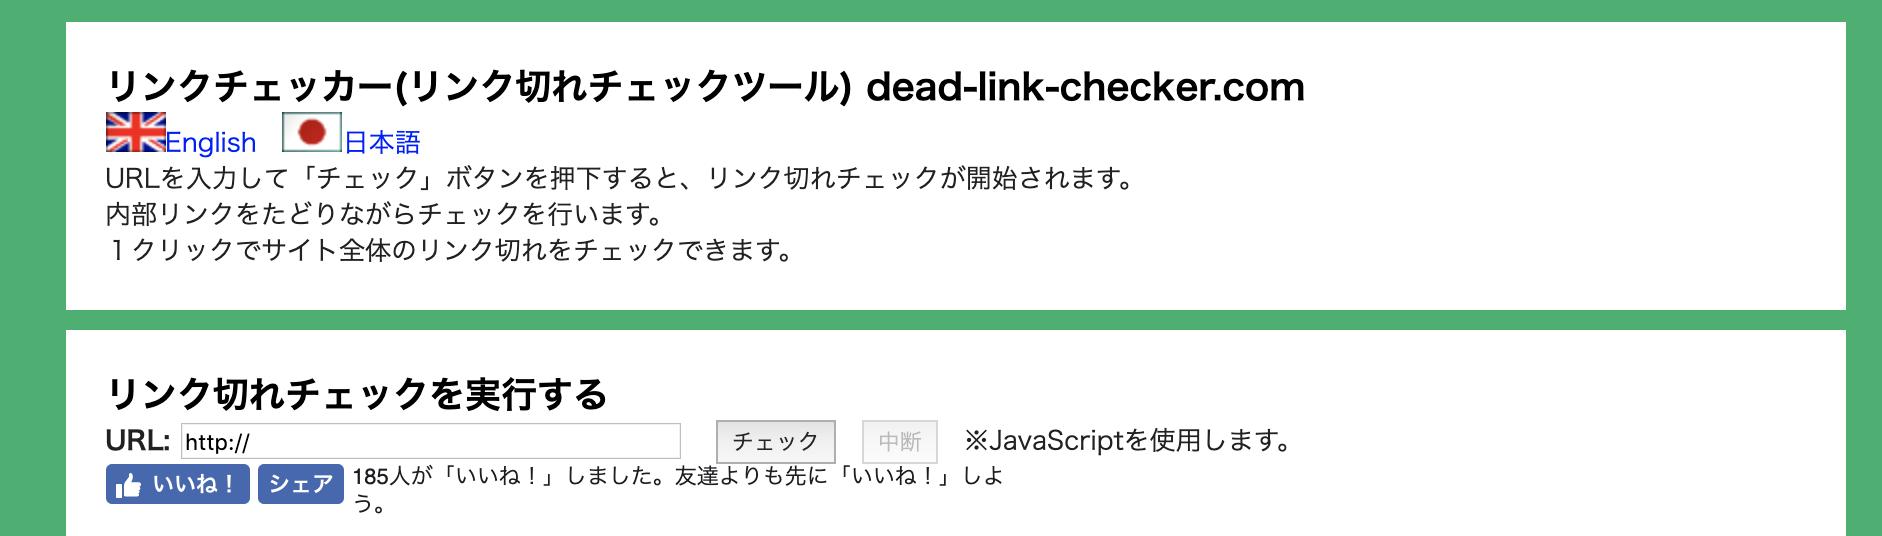 Dead-link-checker.com_リンク切れツール